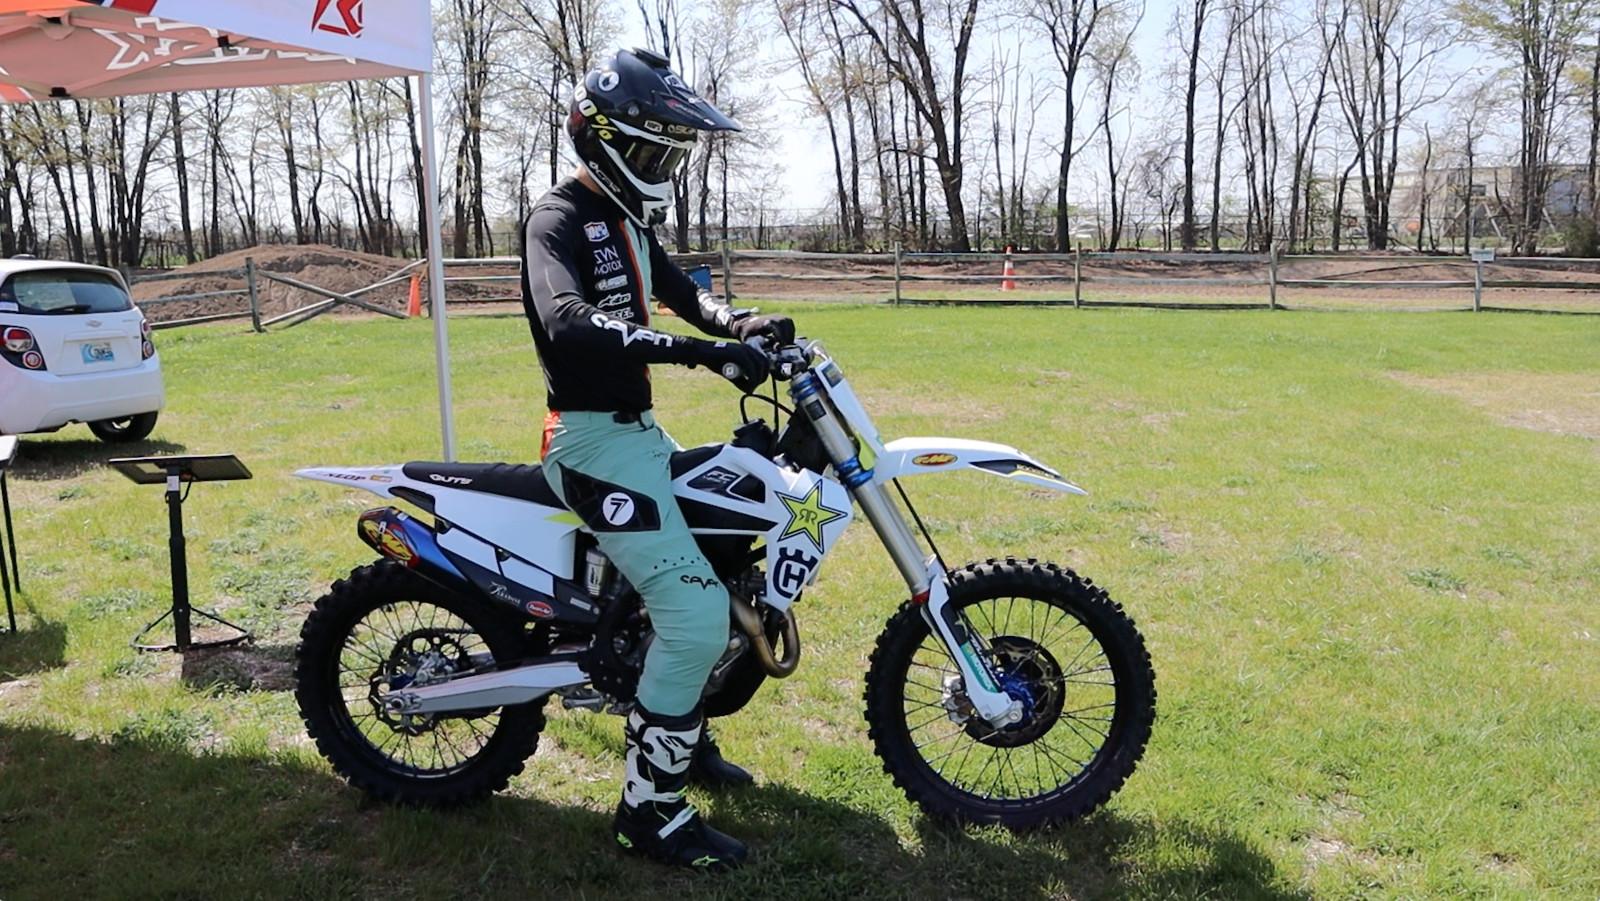 Screen Shot 2019-05-08 at 7 55 00 AM - JeffWalker841 - Motocross Pictures - Vital MX